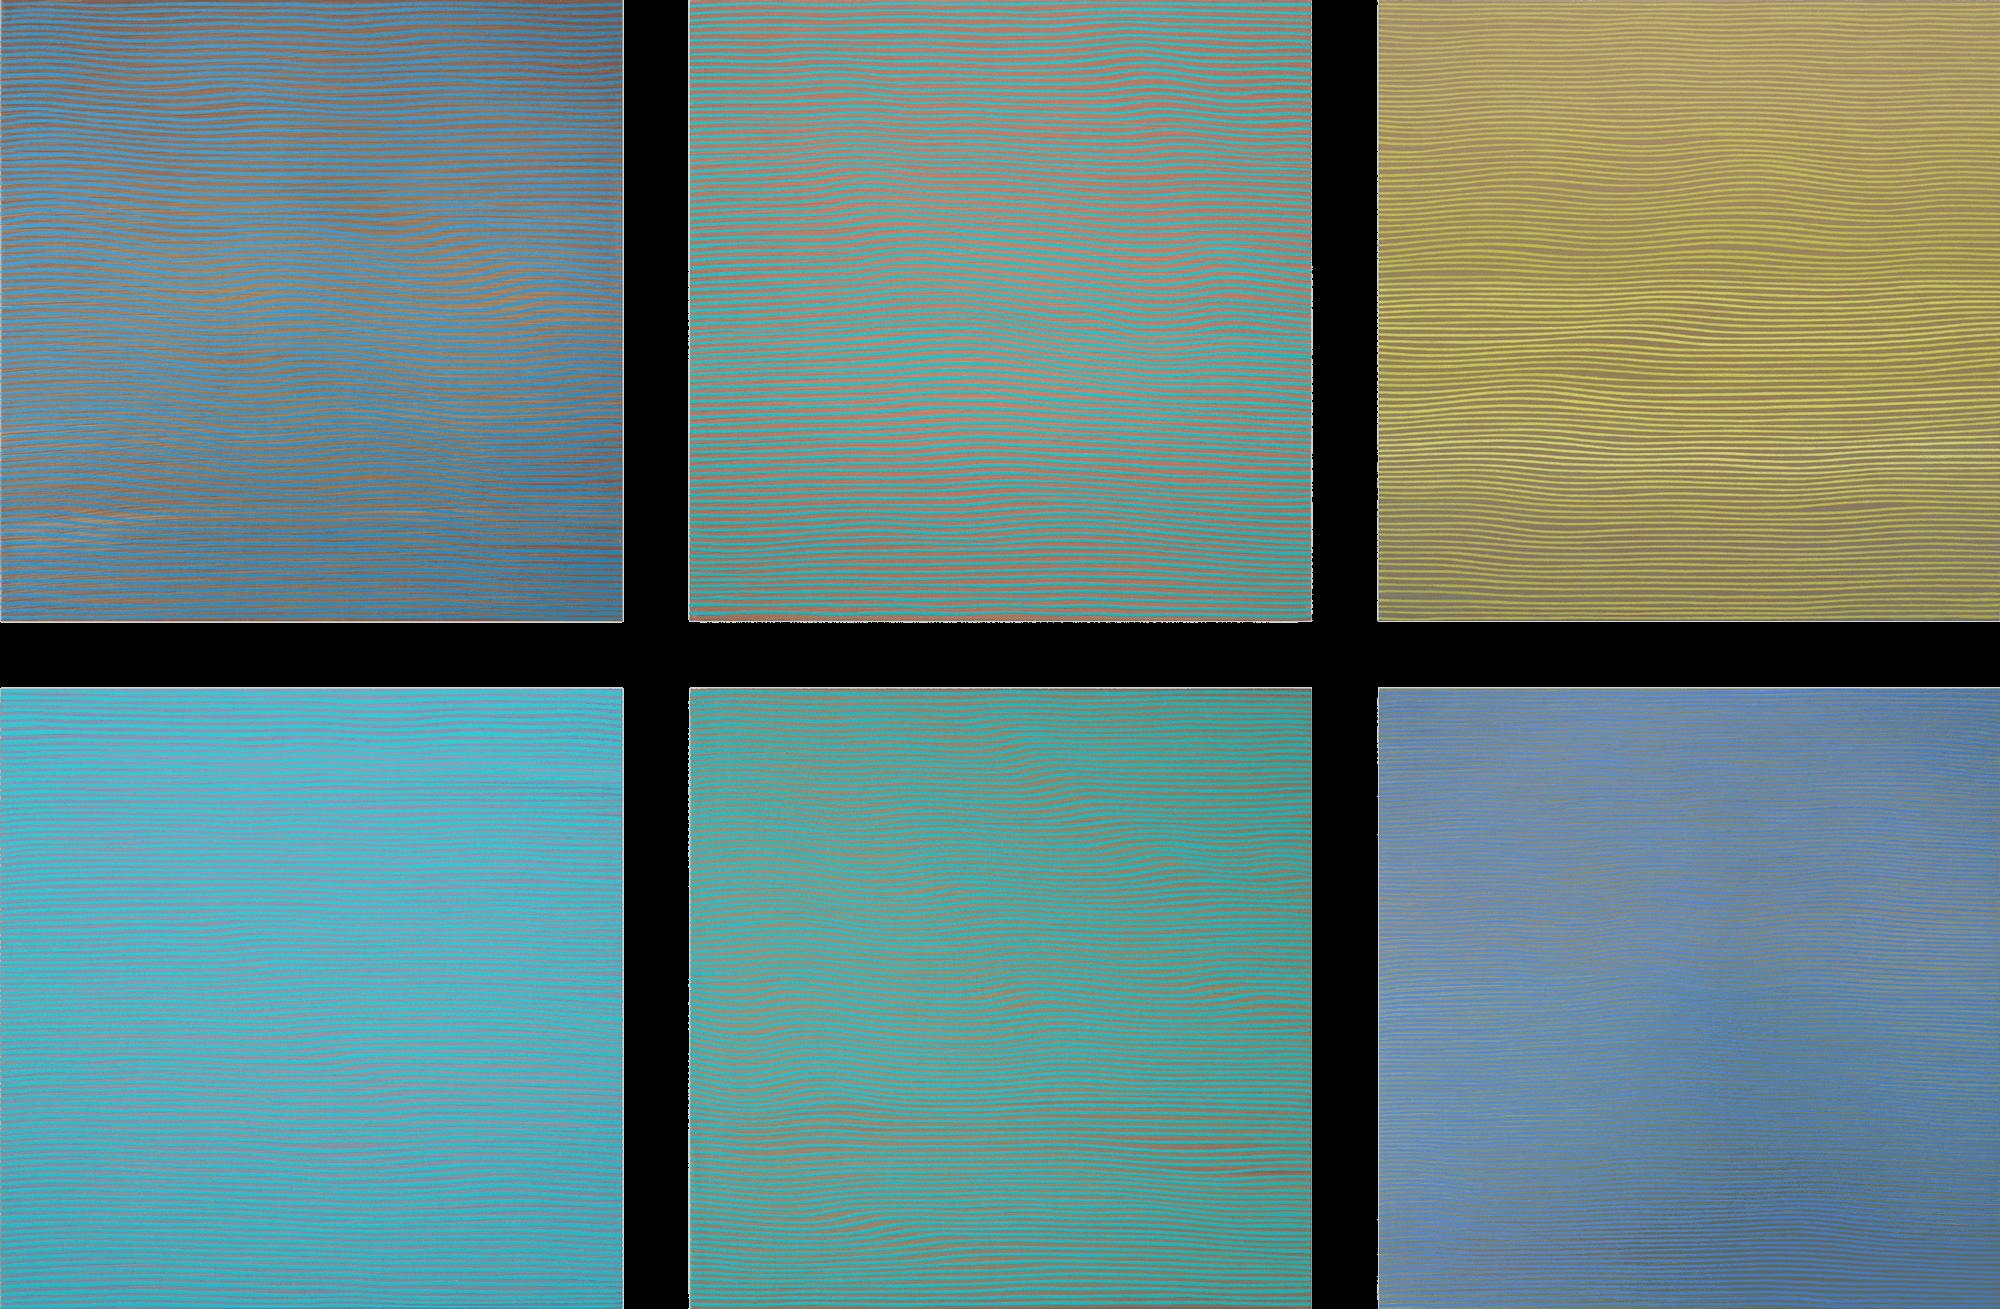 Slide Mono 1, 2, 8, 3, 4, 5